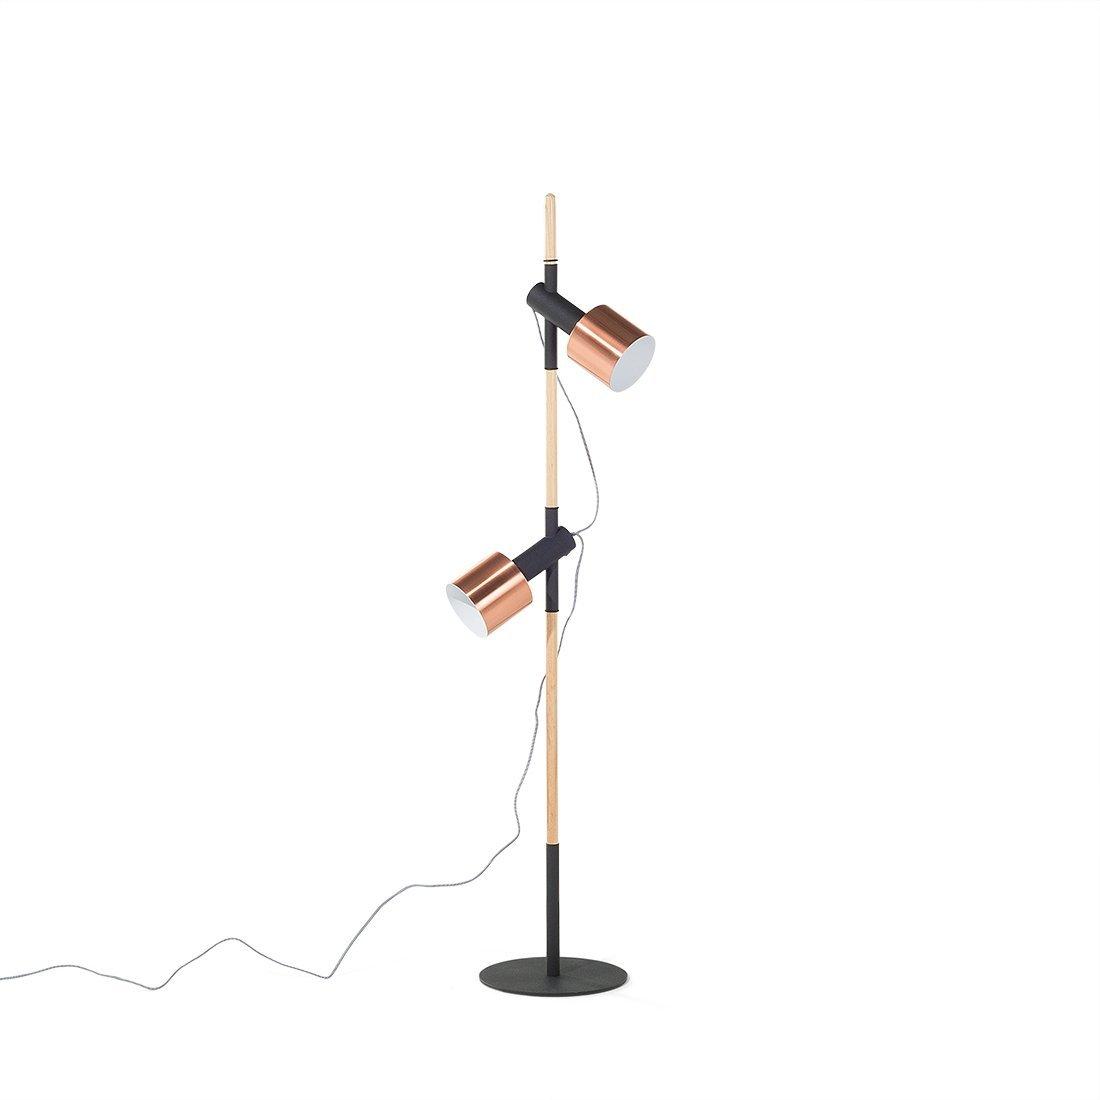 Beliani Stehlampe Schwarz 148 Cm Owens Beliani Amazon De Kuche